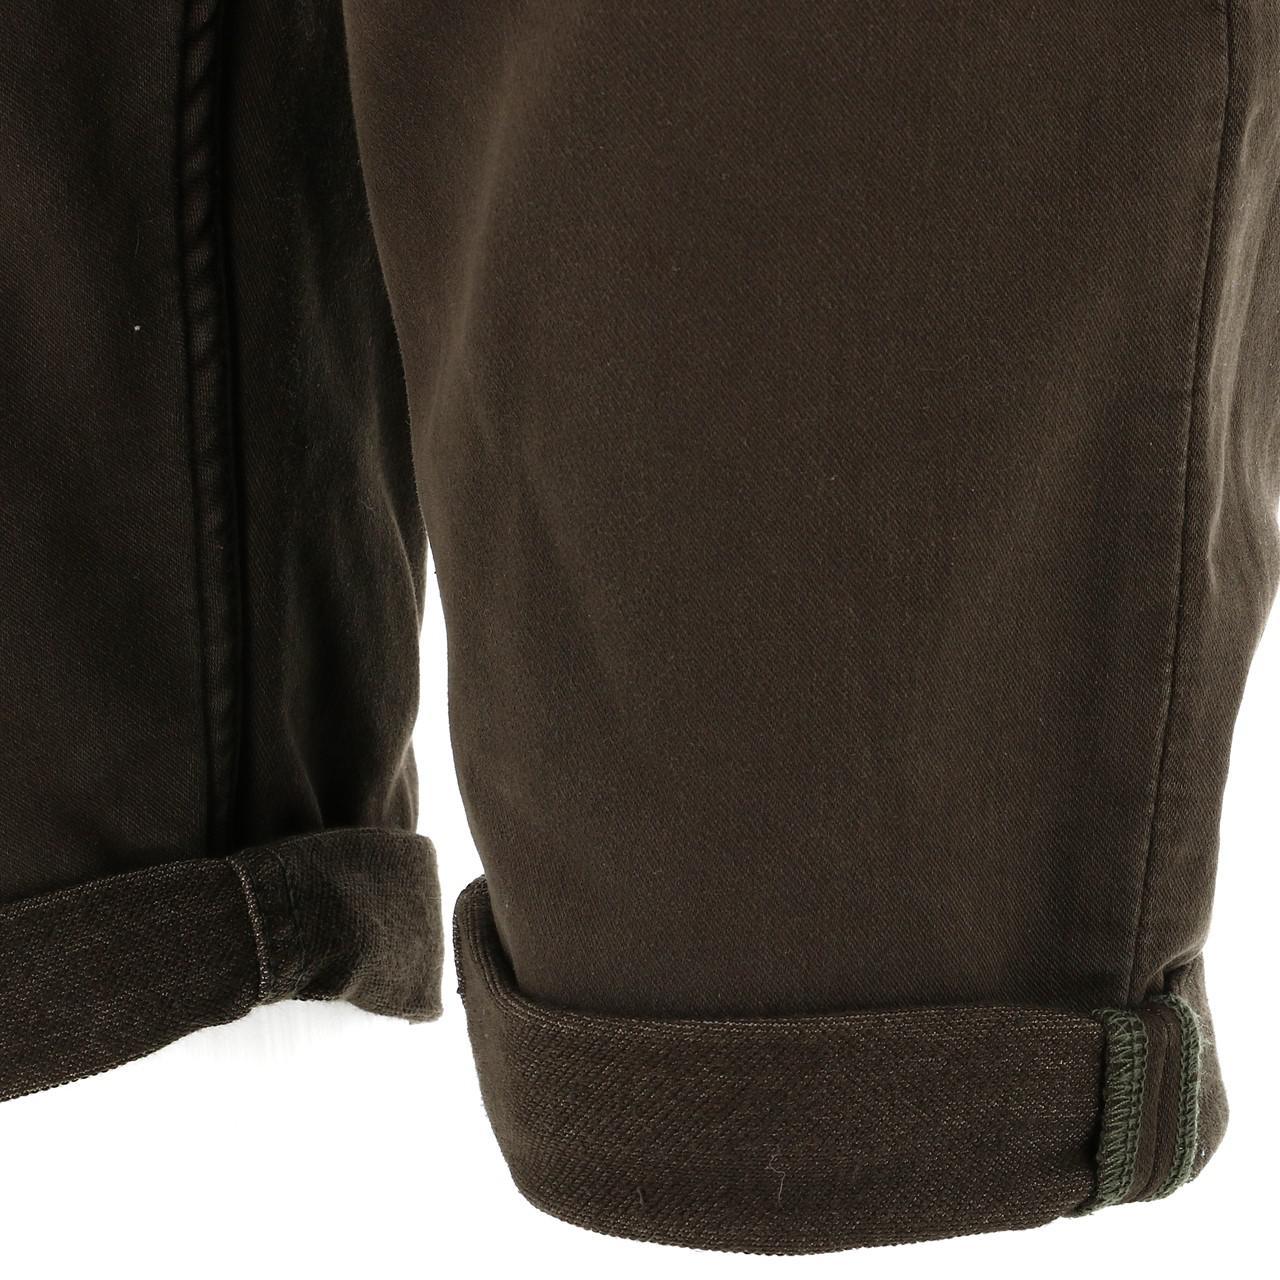 Bermuda-Shorts-Teddy-Smith-Scotty-3-Middl-Khaki-Shorts-Green-18133-New thumbnail 4